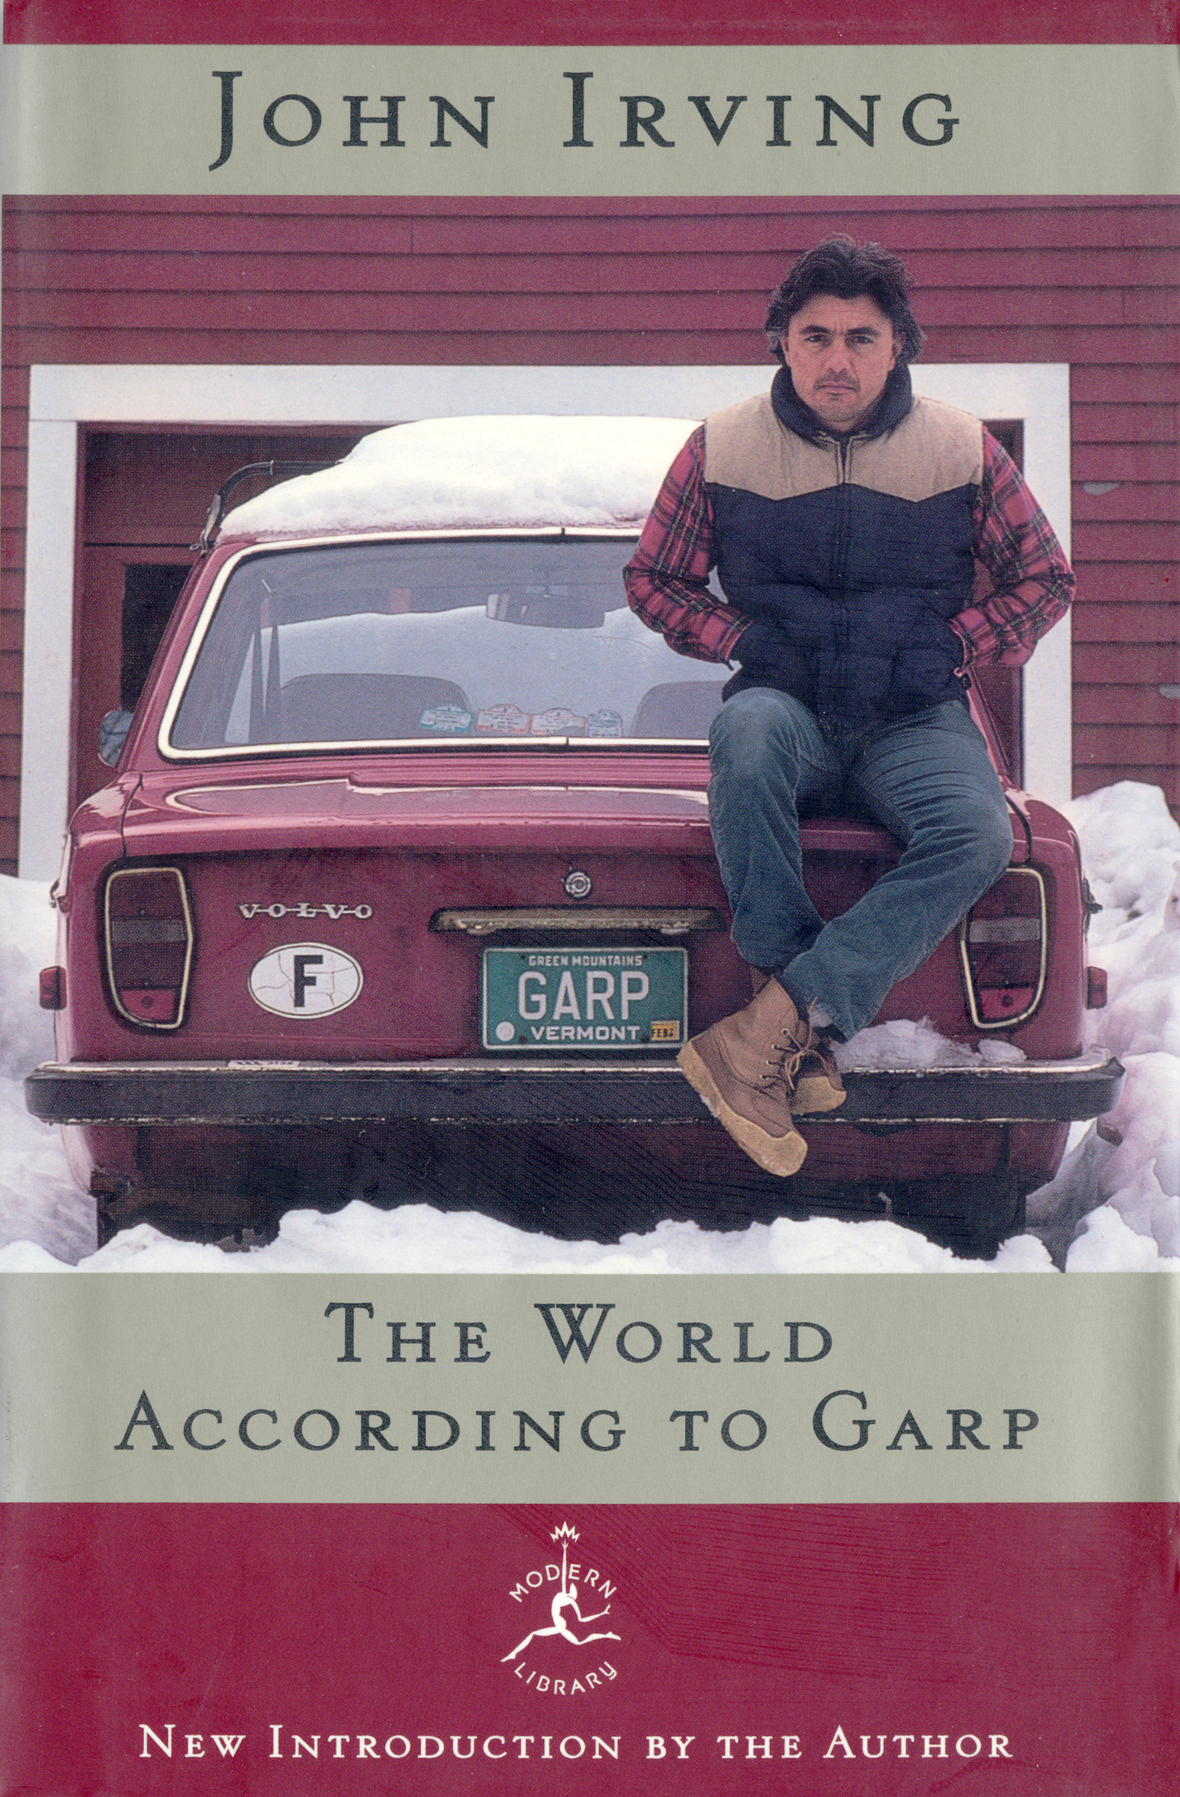 DLPP18 book Jacket The World According to Garp